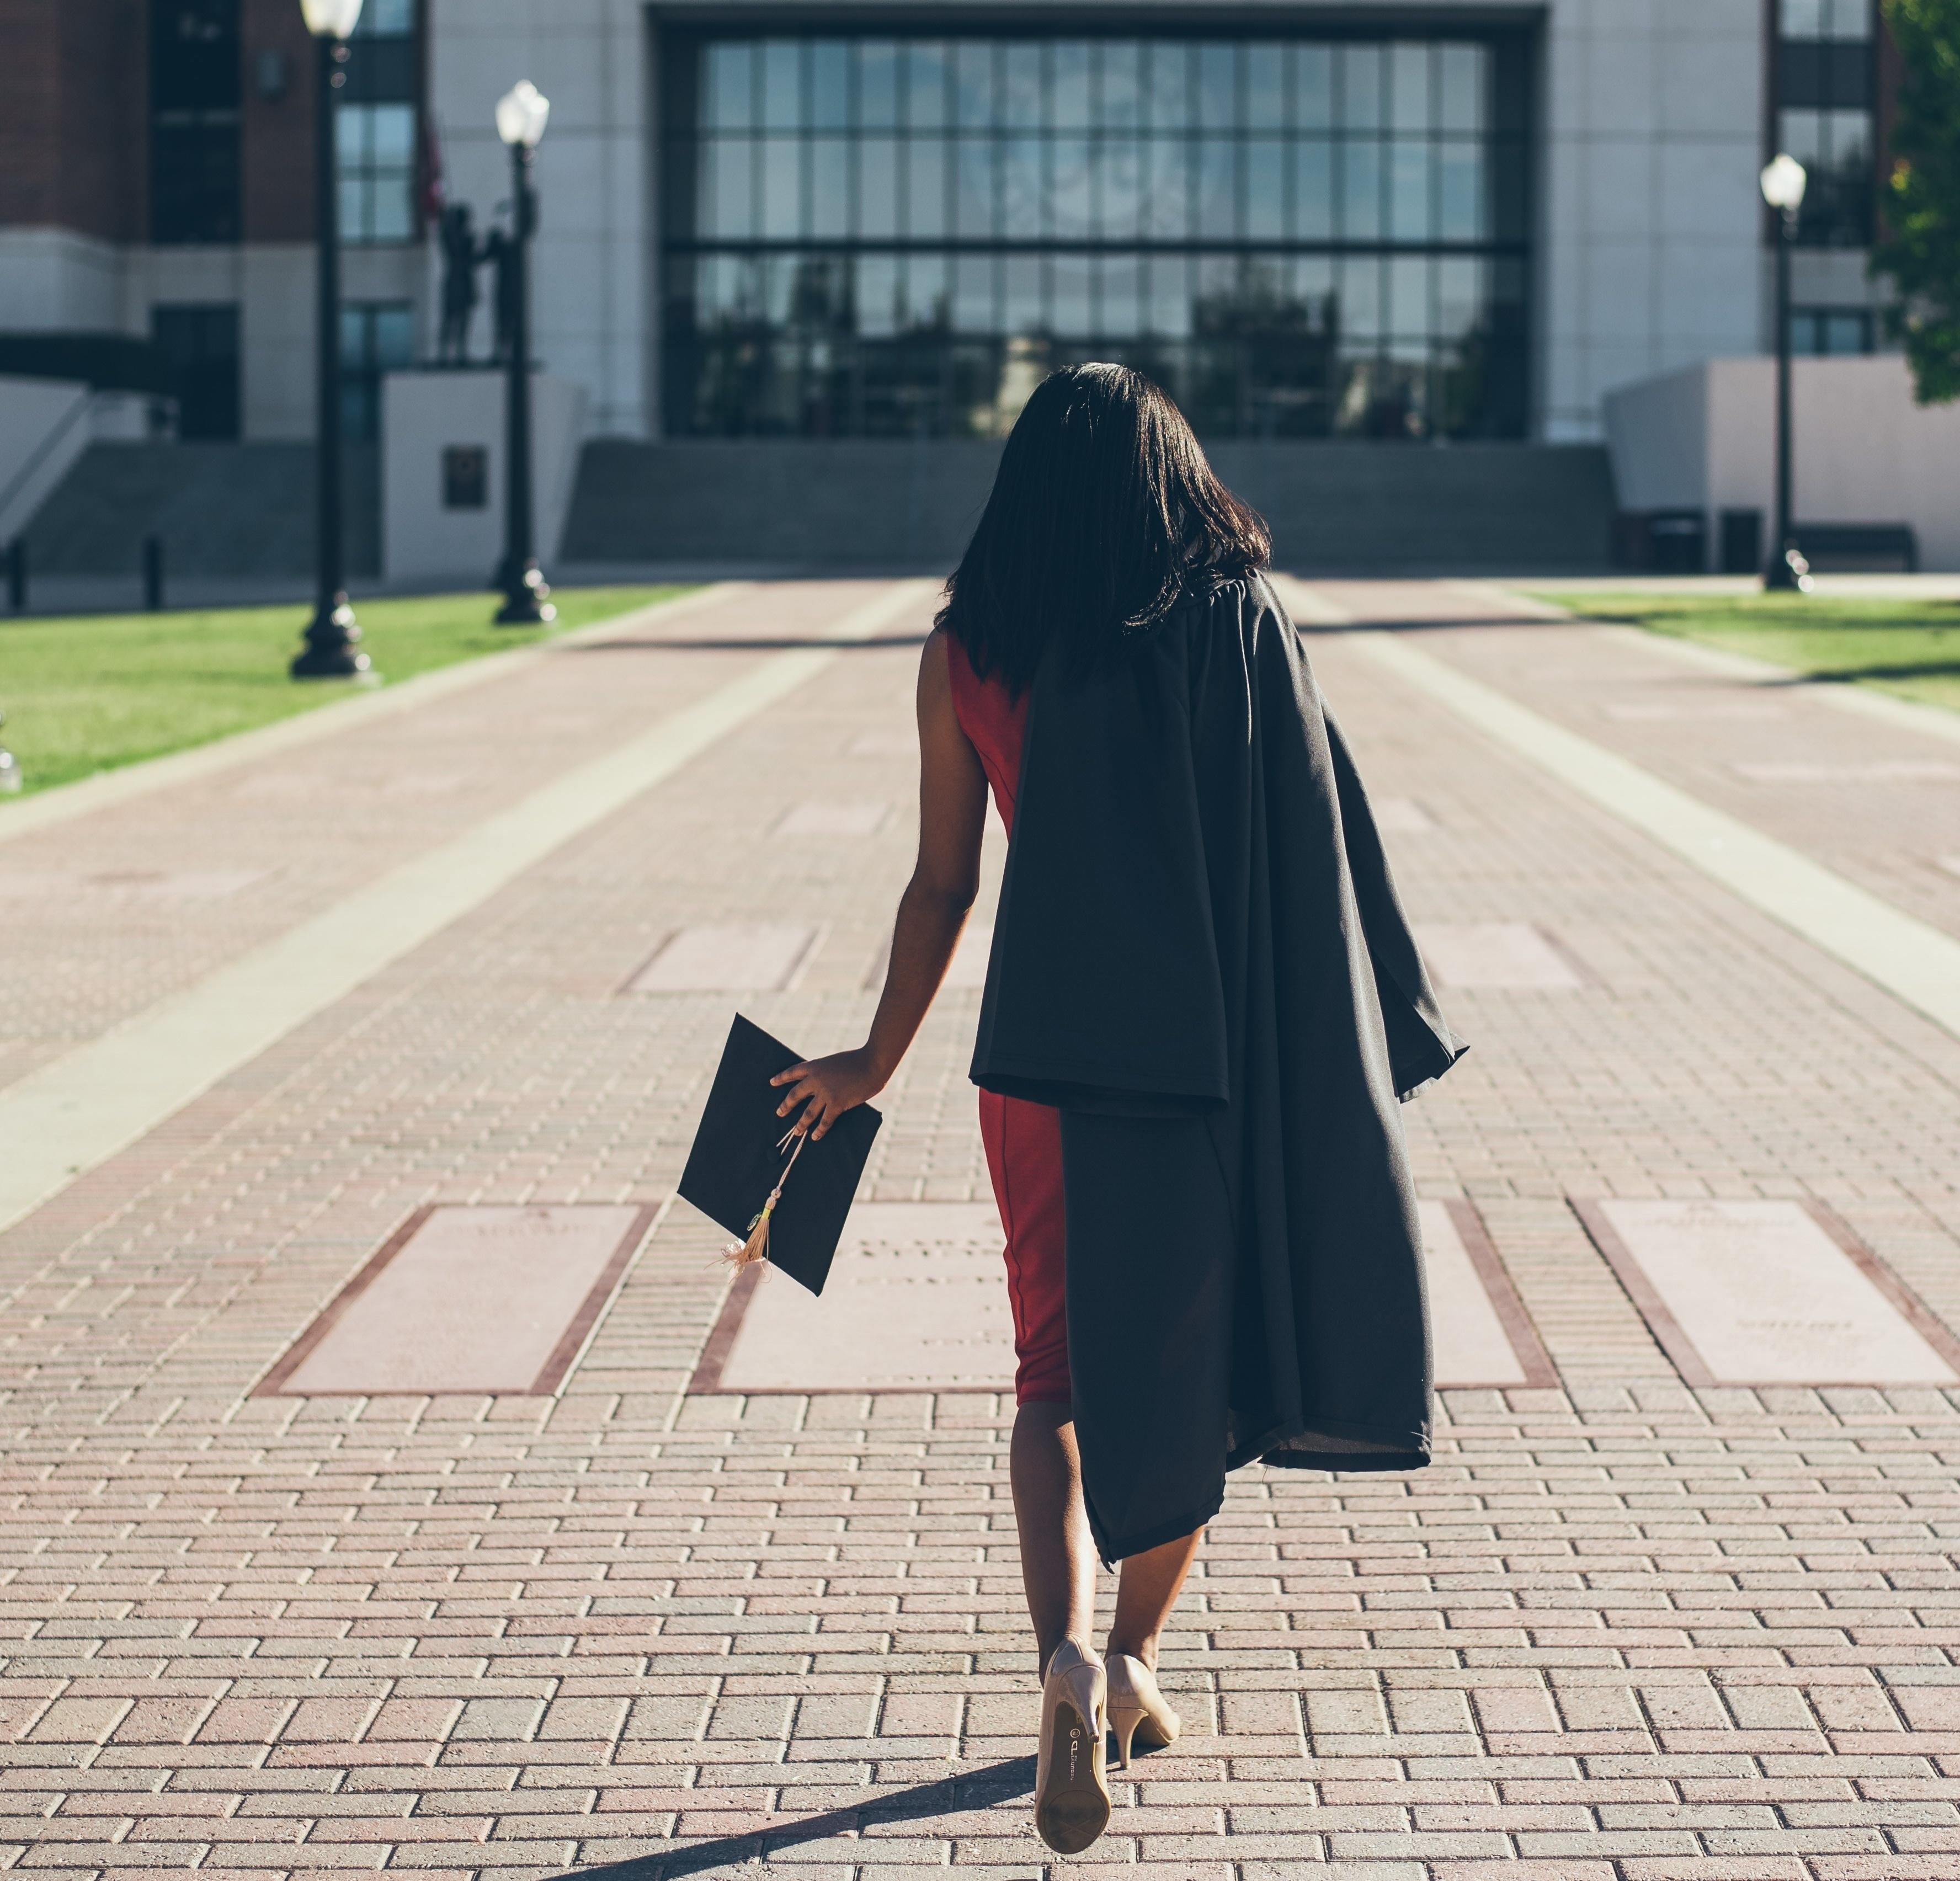 Recent graduate walking away